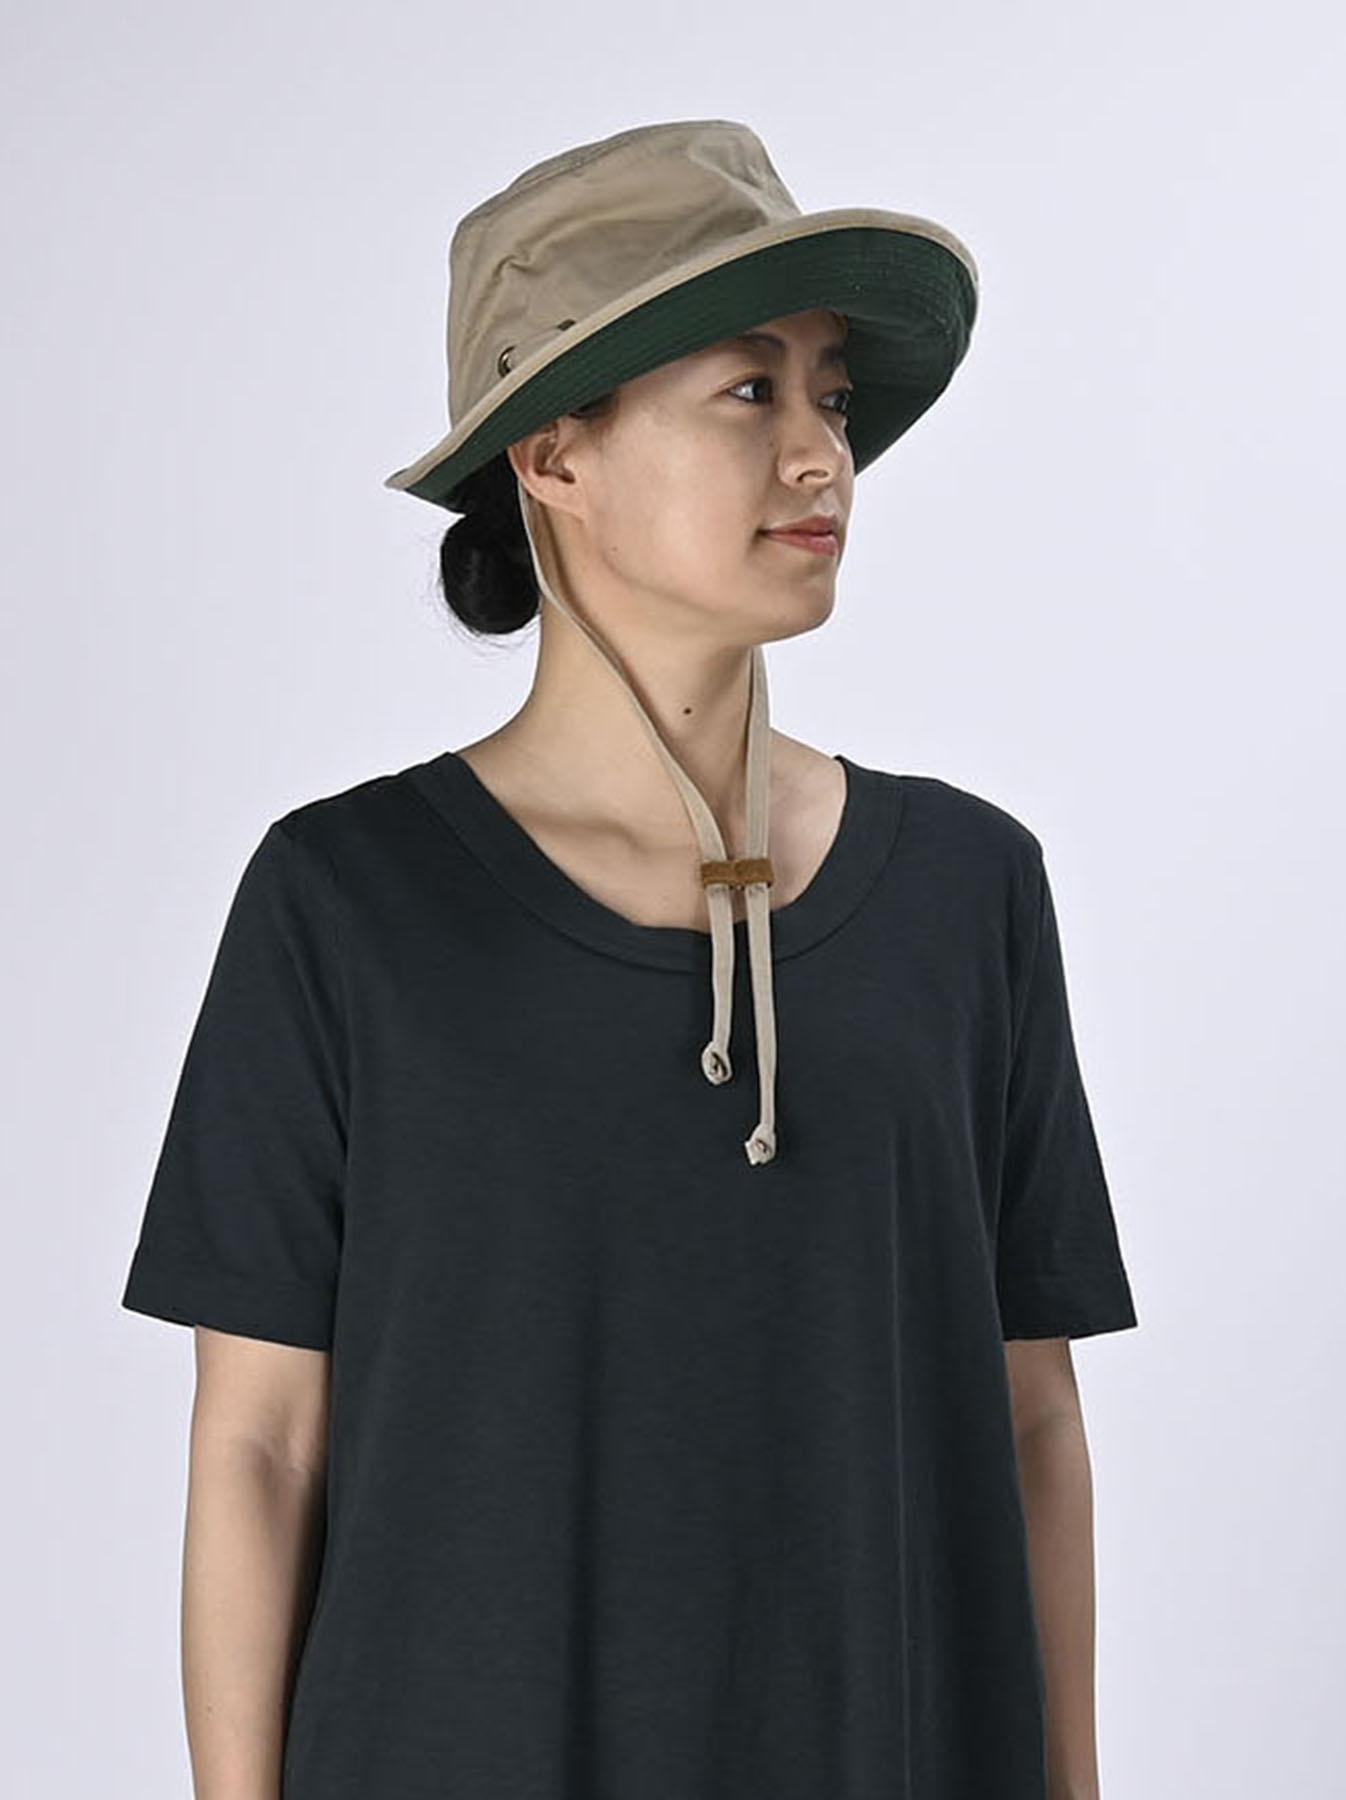 Okome Chino Sail Hat (0521)-3